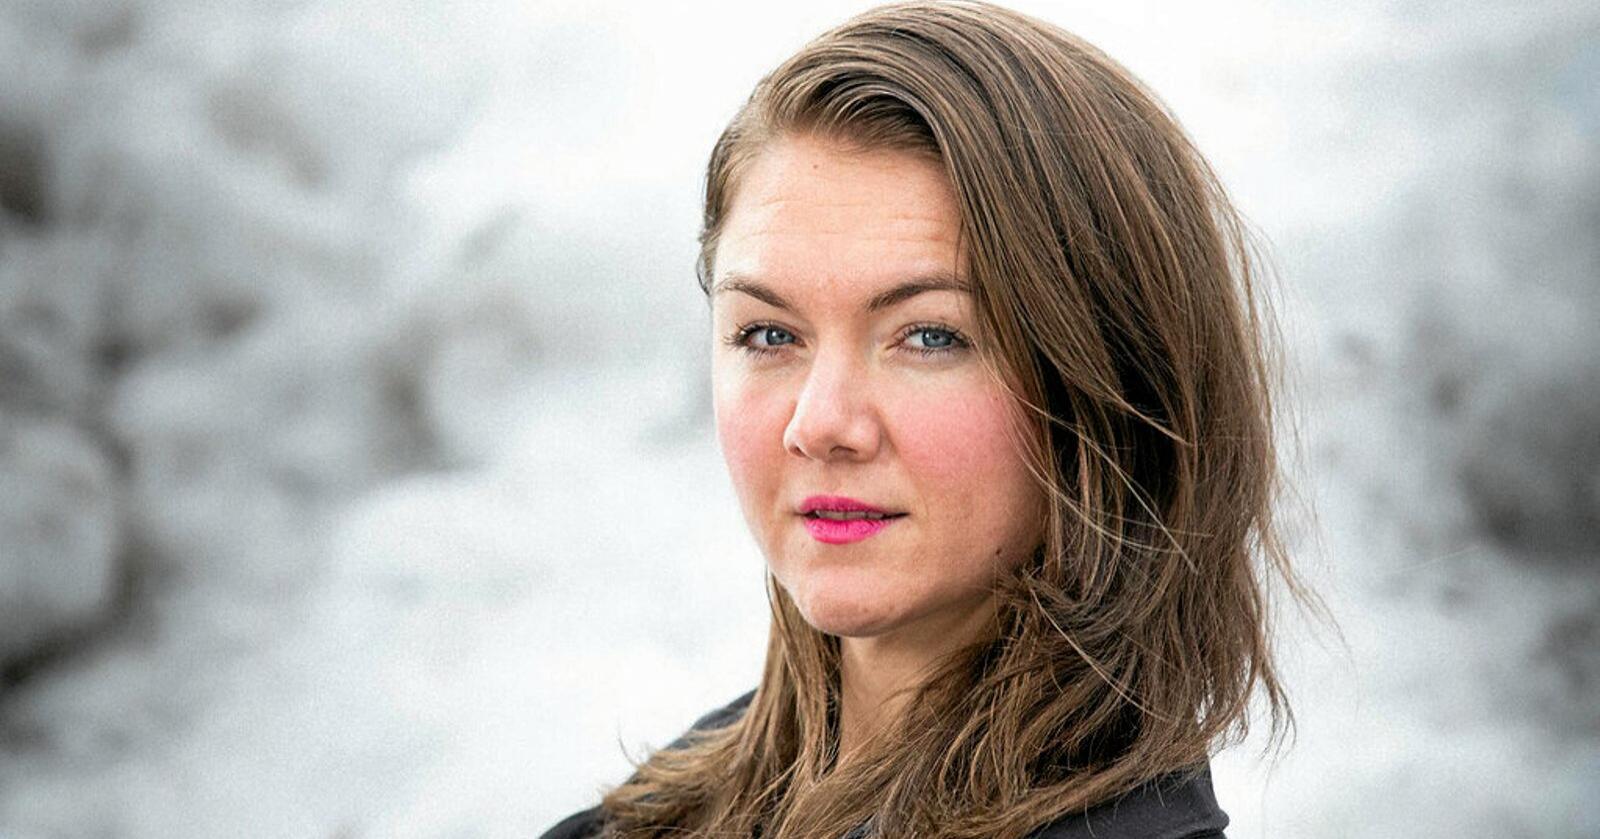 Sigrid Heiberg, leder i Oslo MDG håper på flere norske hender i landbruket. Foto: Miljøpartiet de Grønne